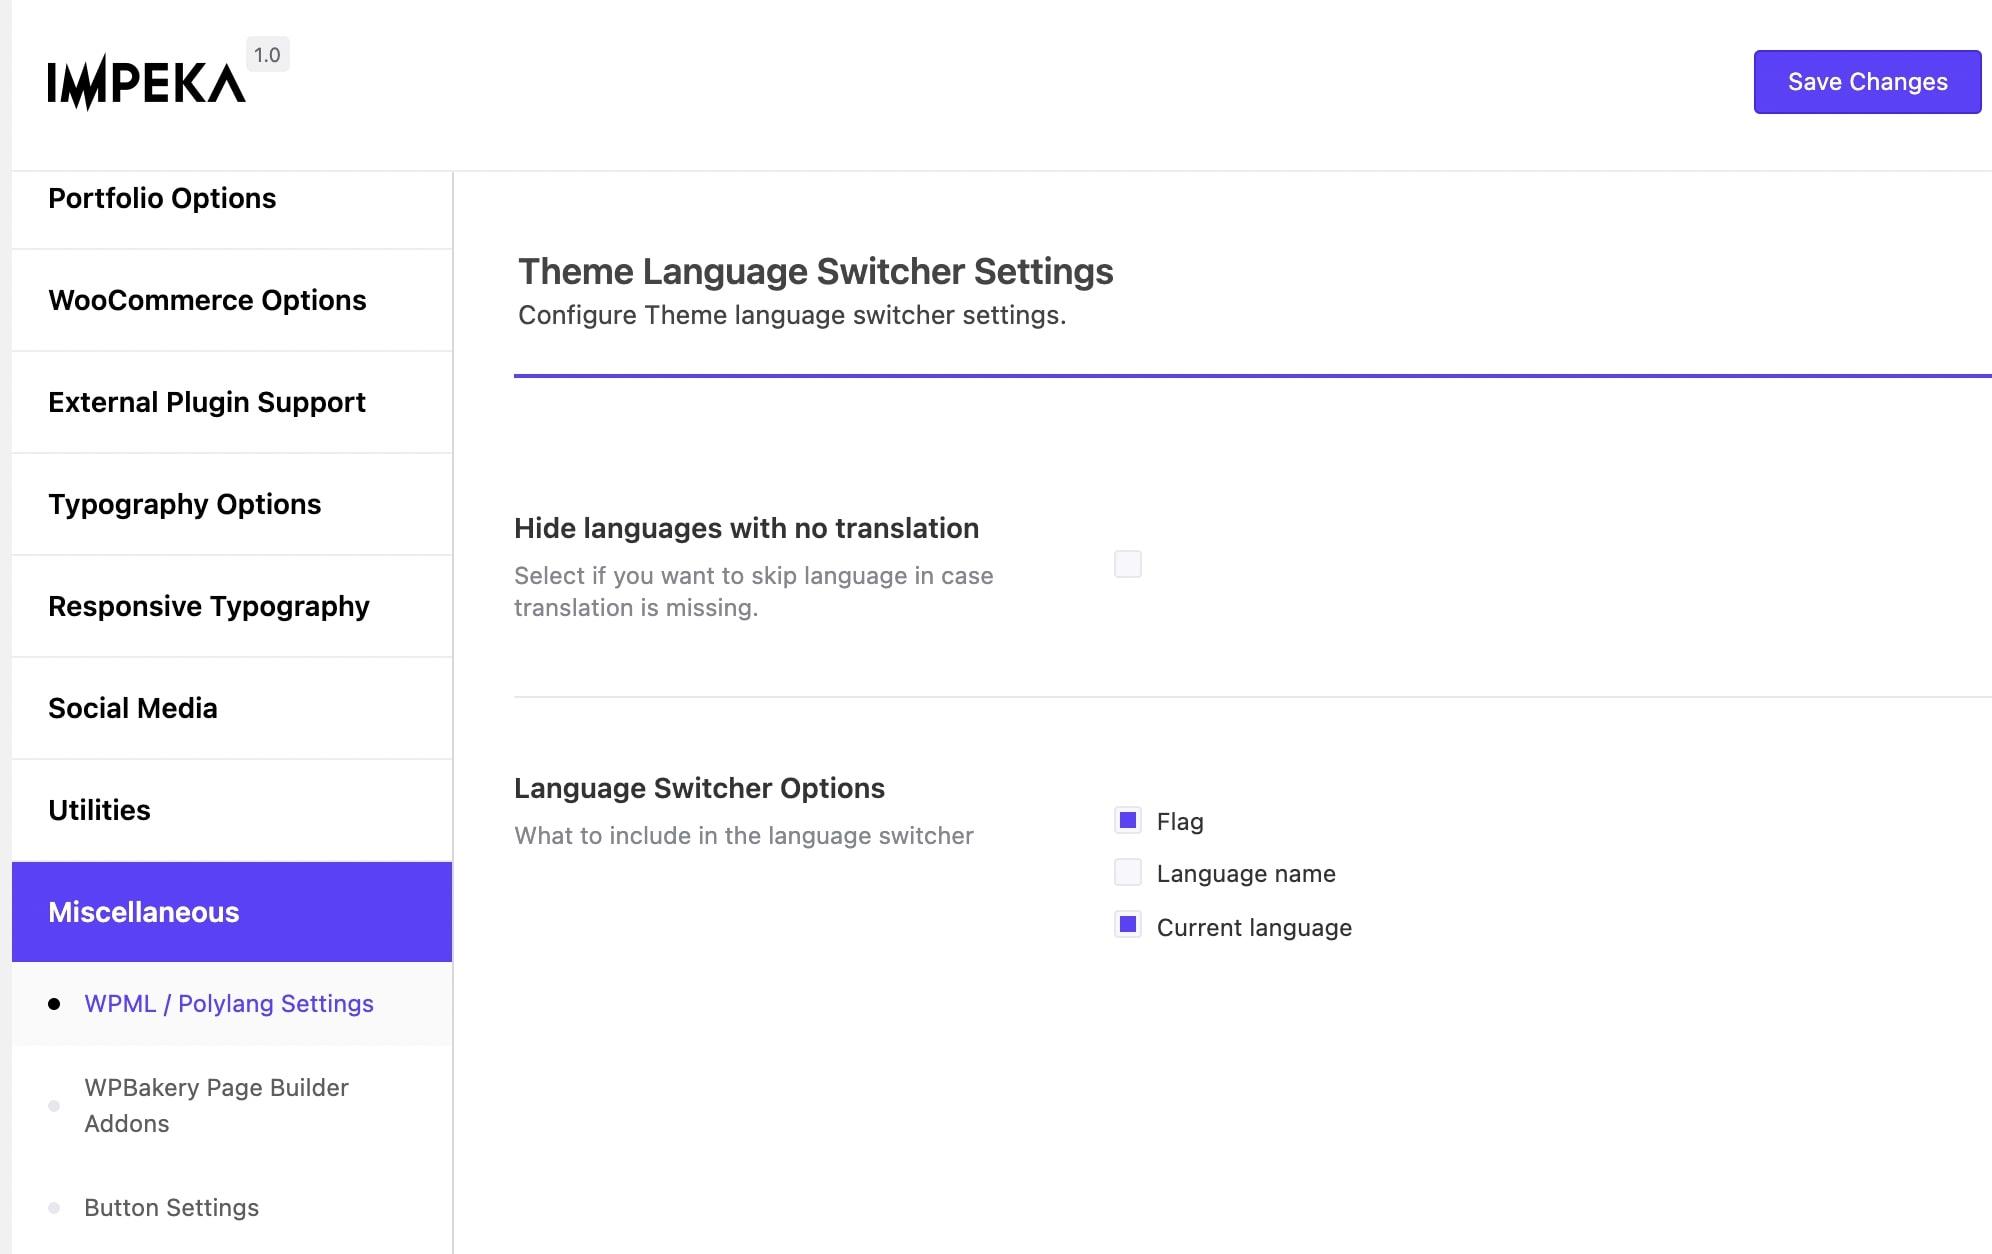 Theme Language Switcher Settings in Impeka